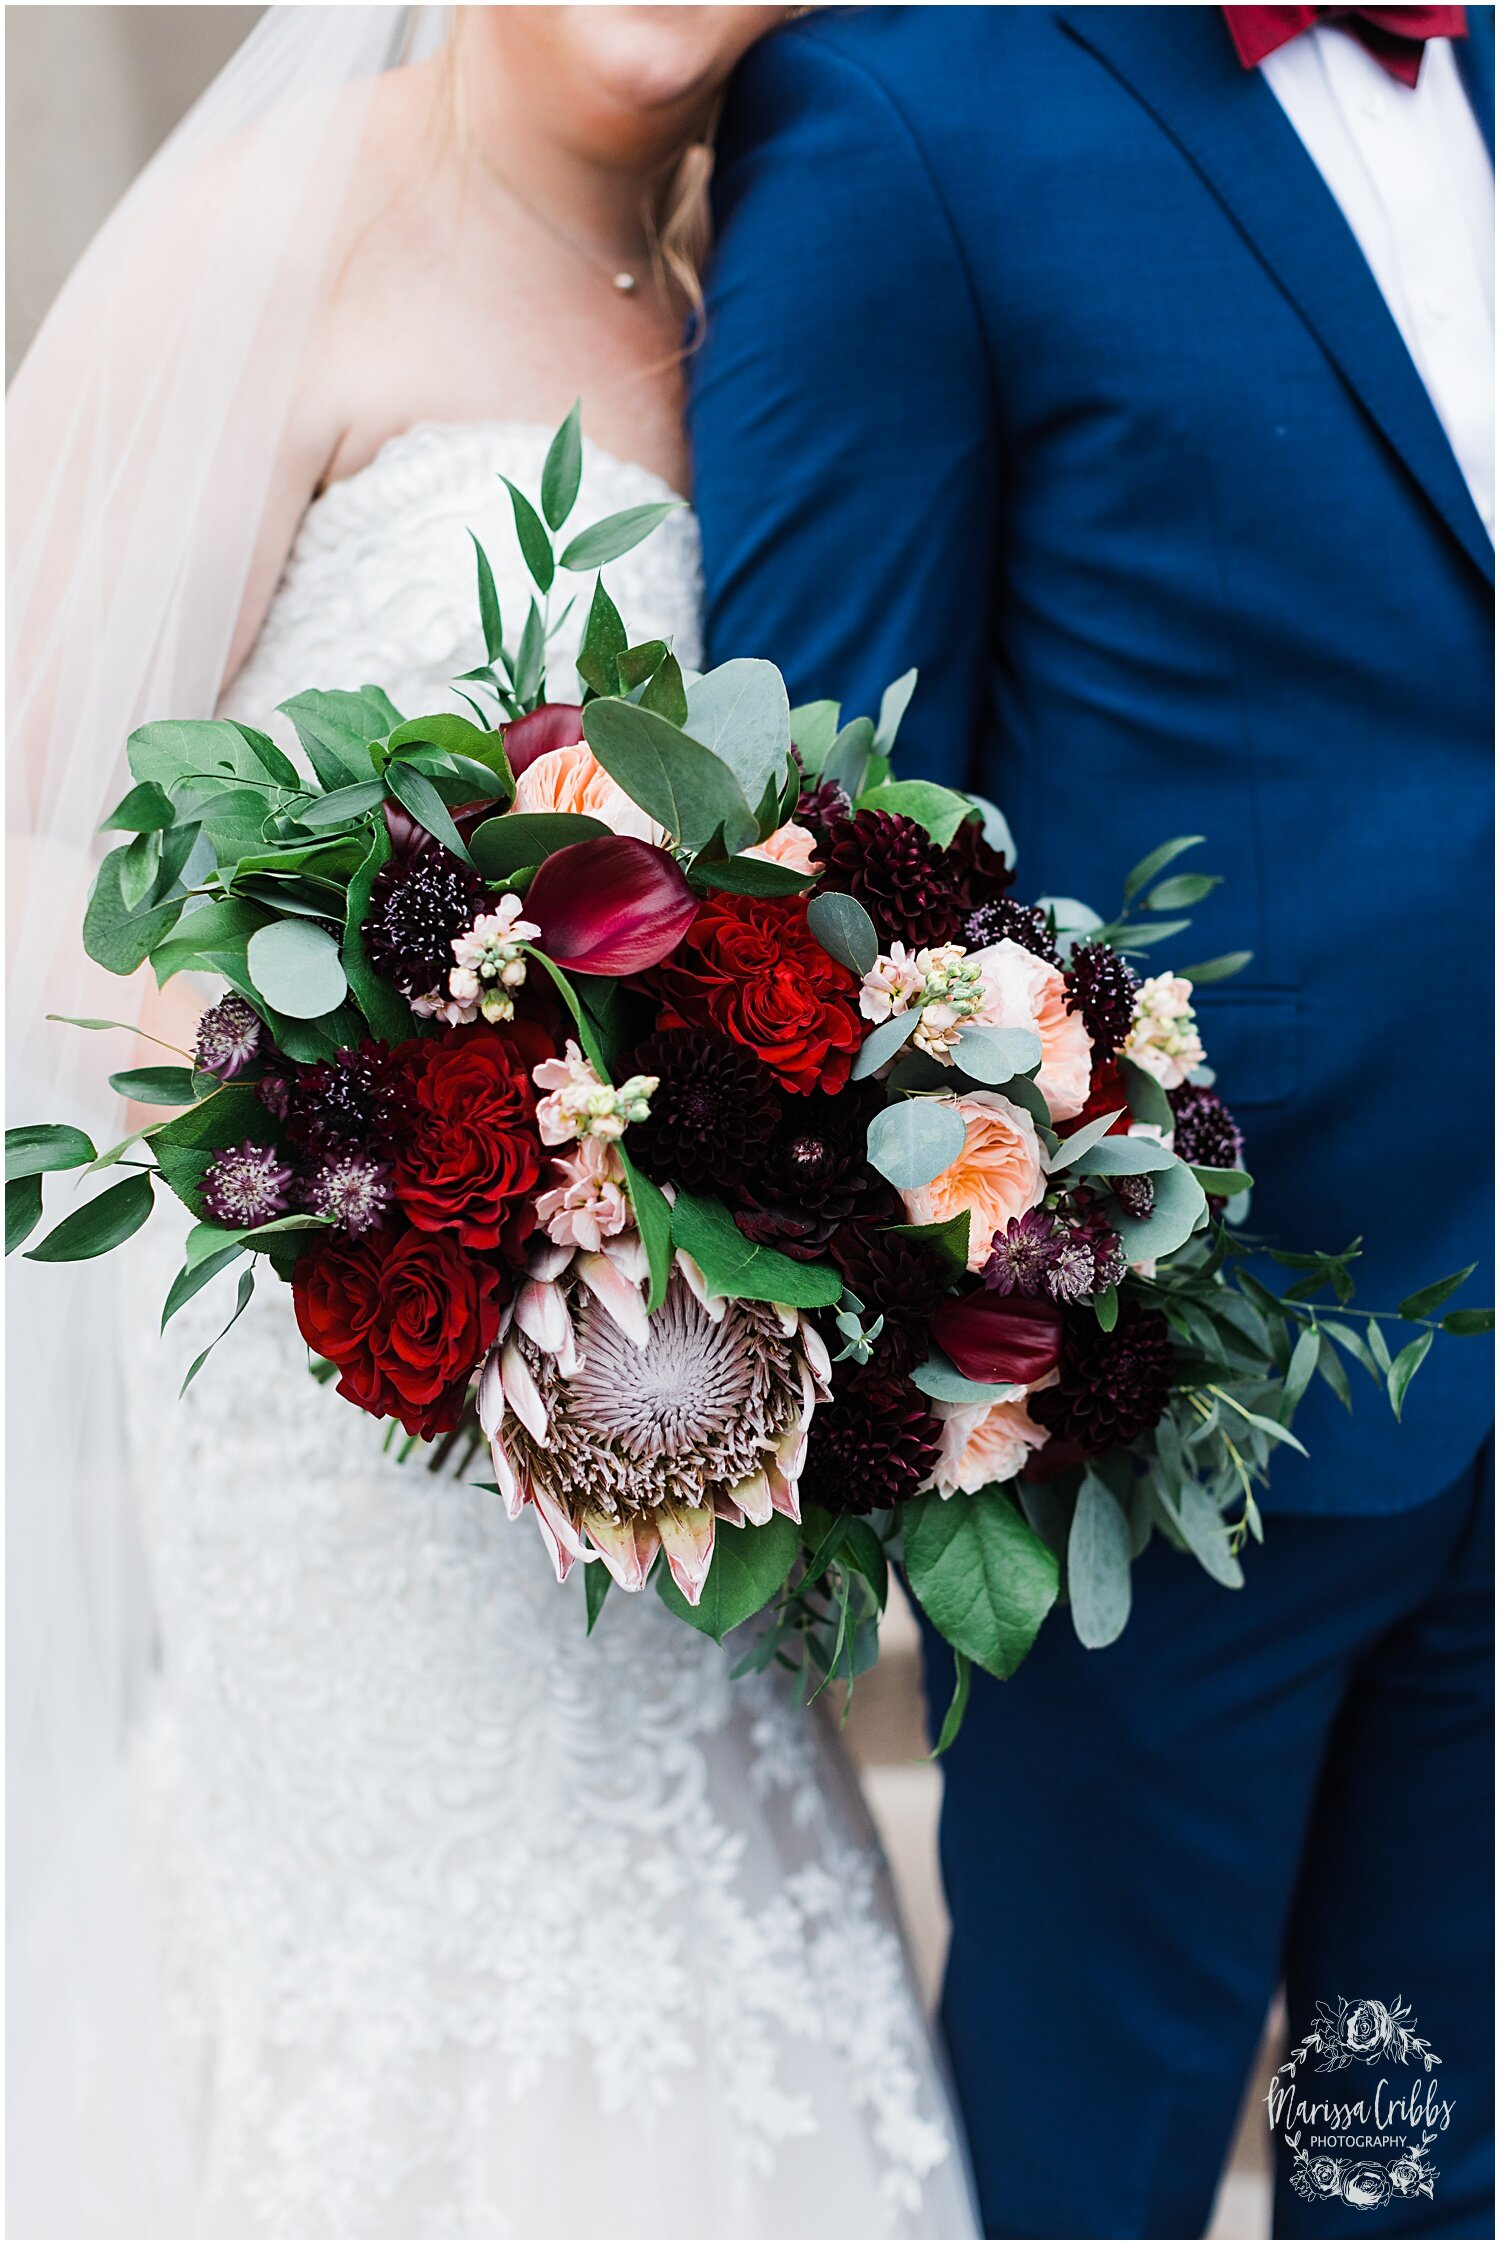 ANNA & LUKE MARRIED BLOG | MARISSA CRIBBS PHOTOGRAPHY | WESTON RED BARN FARM_9380.jpg